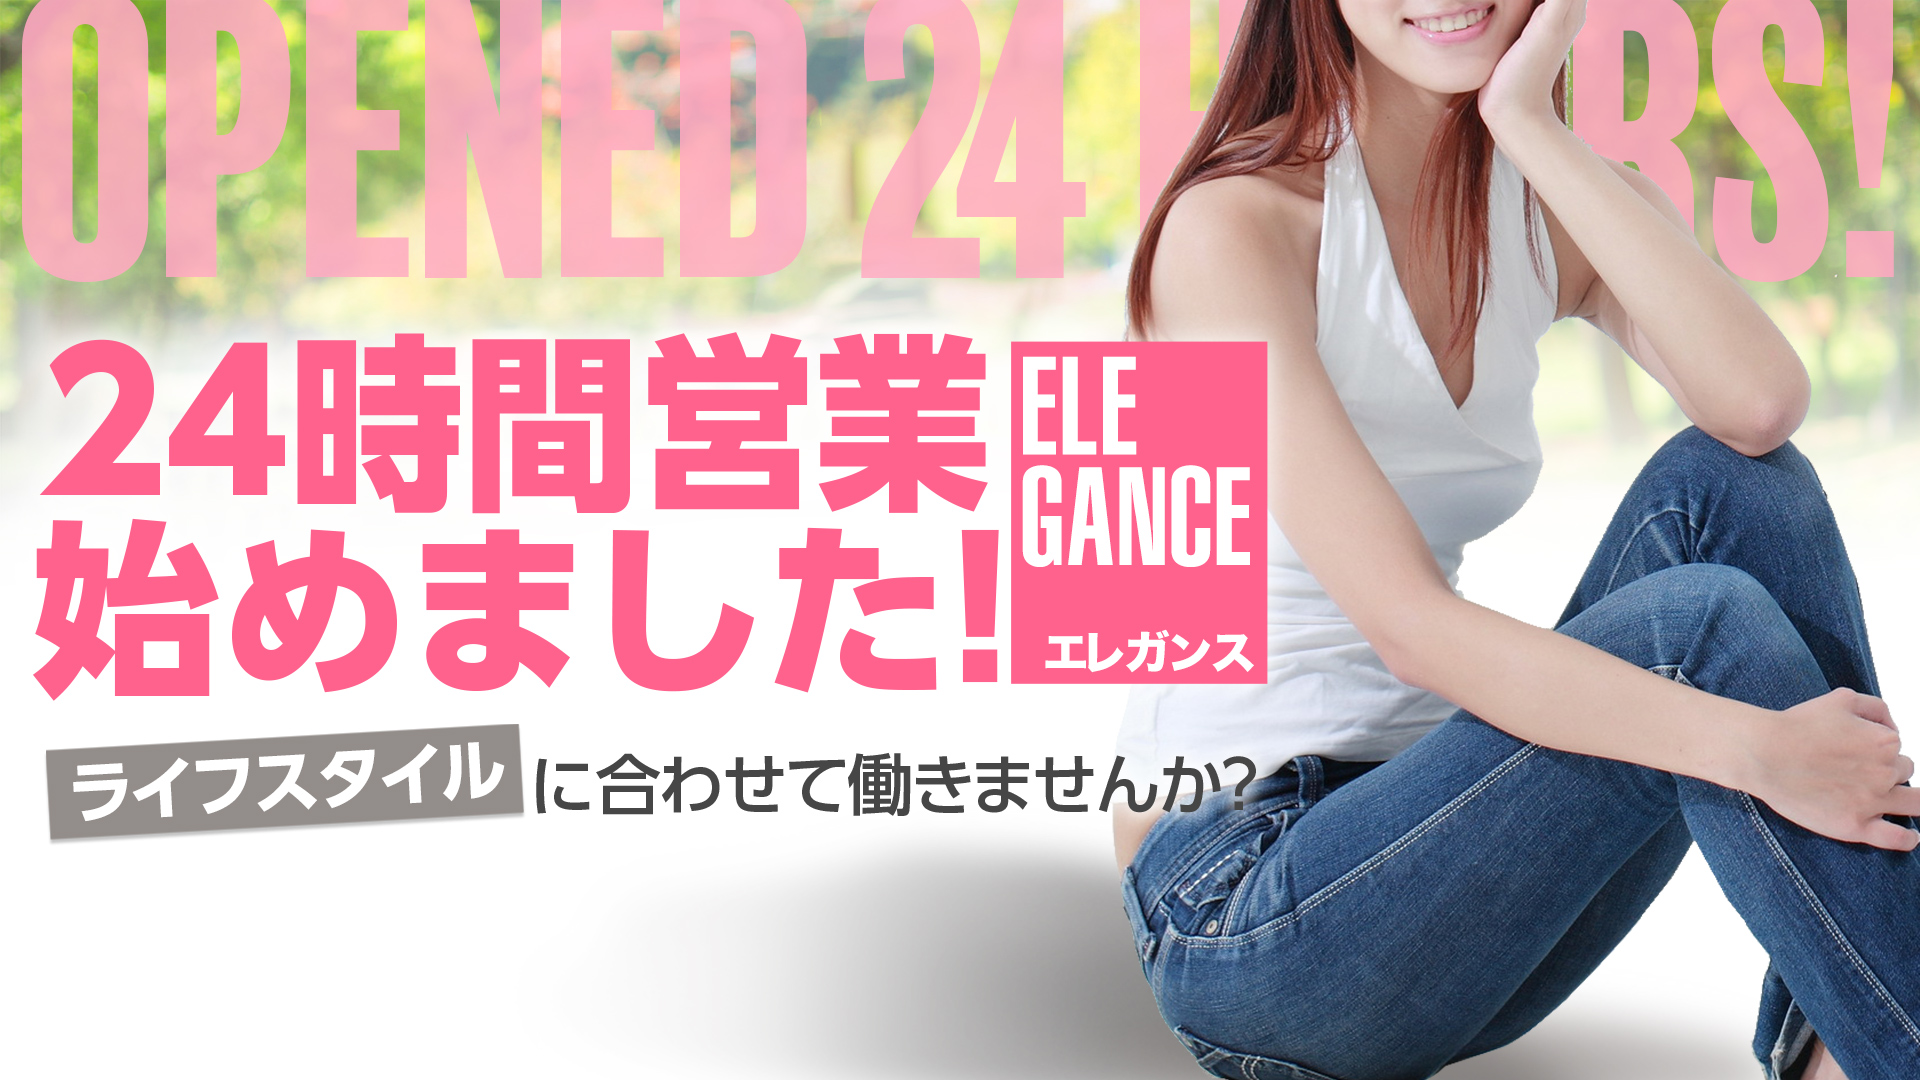 ELEGANCE(エレガンス)の求人画像